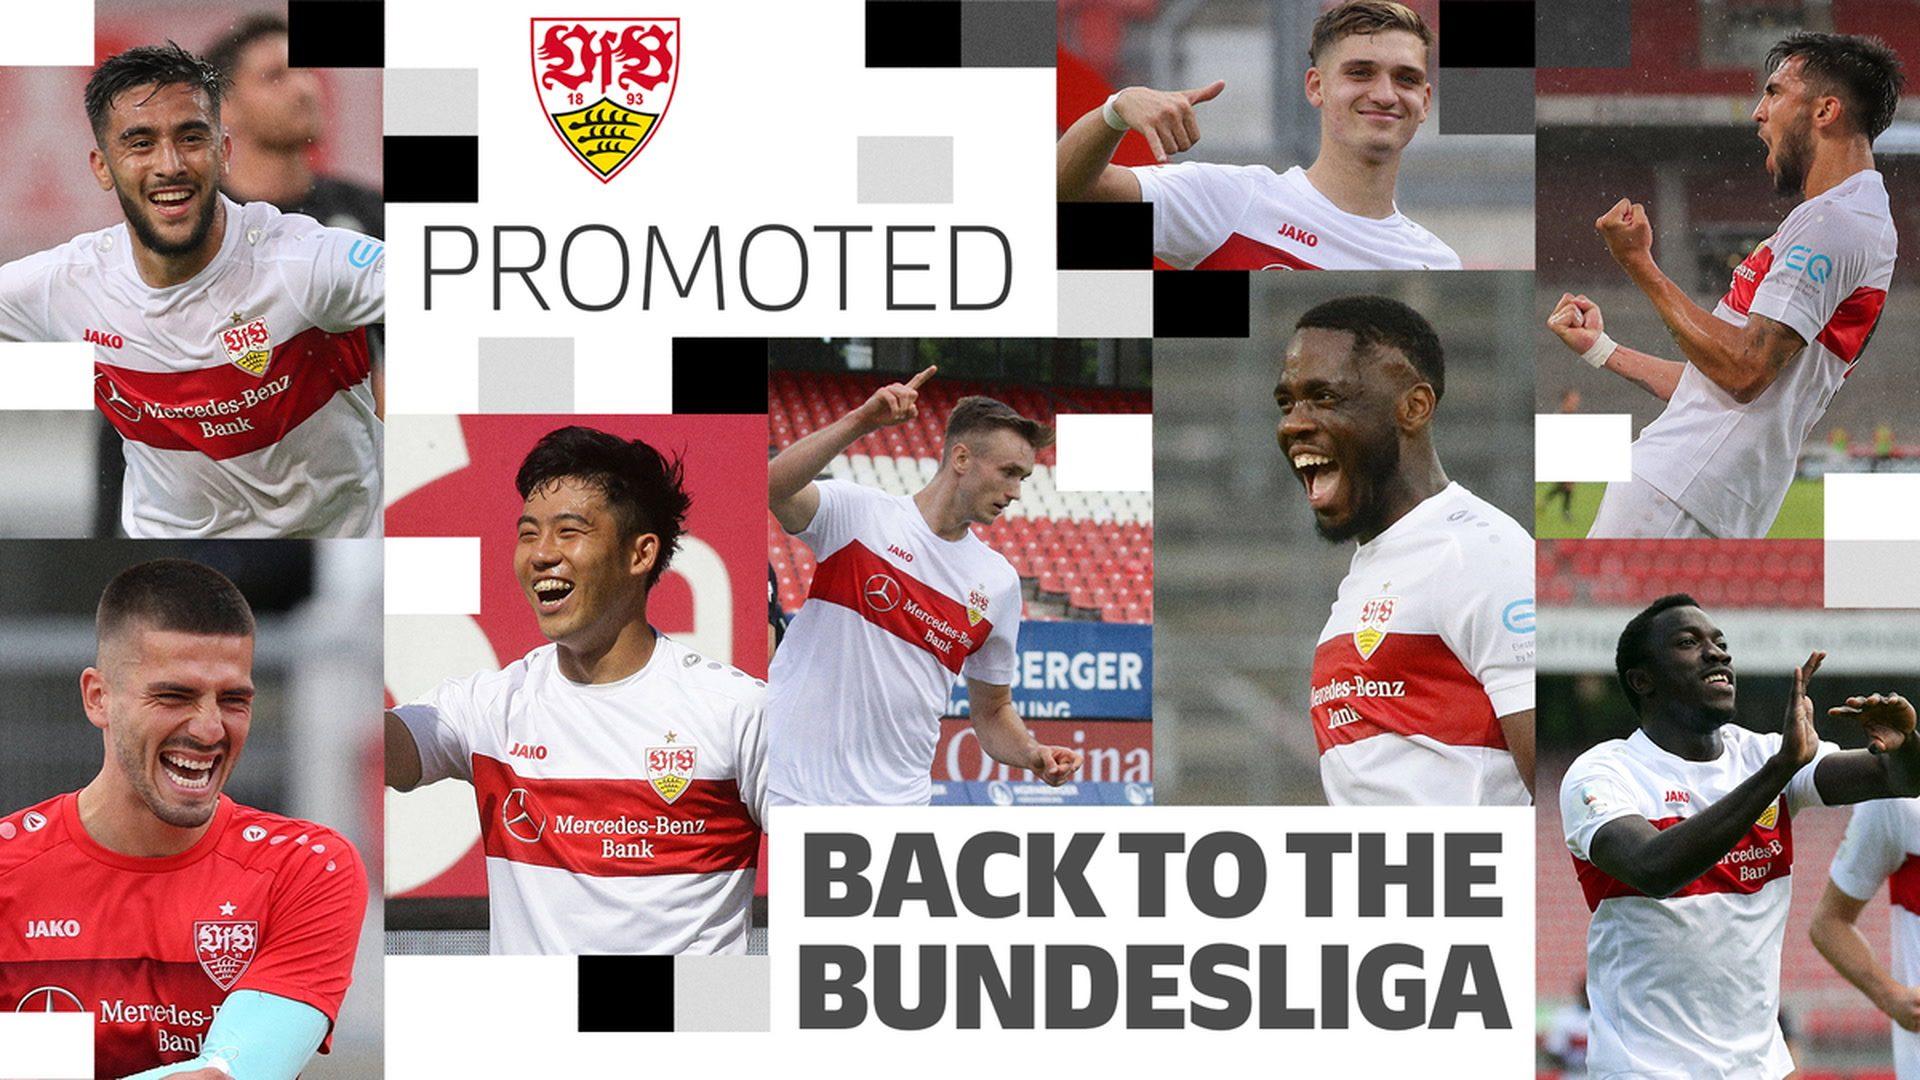 VfB Stuttgart: welcome back to the Bundesliga!